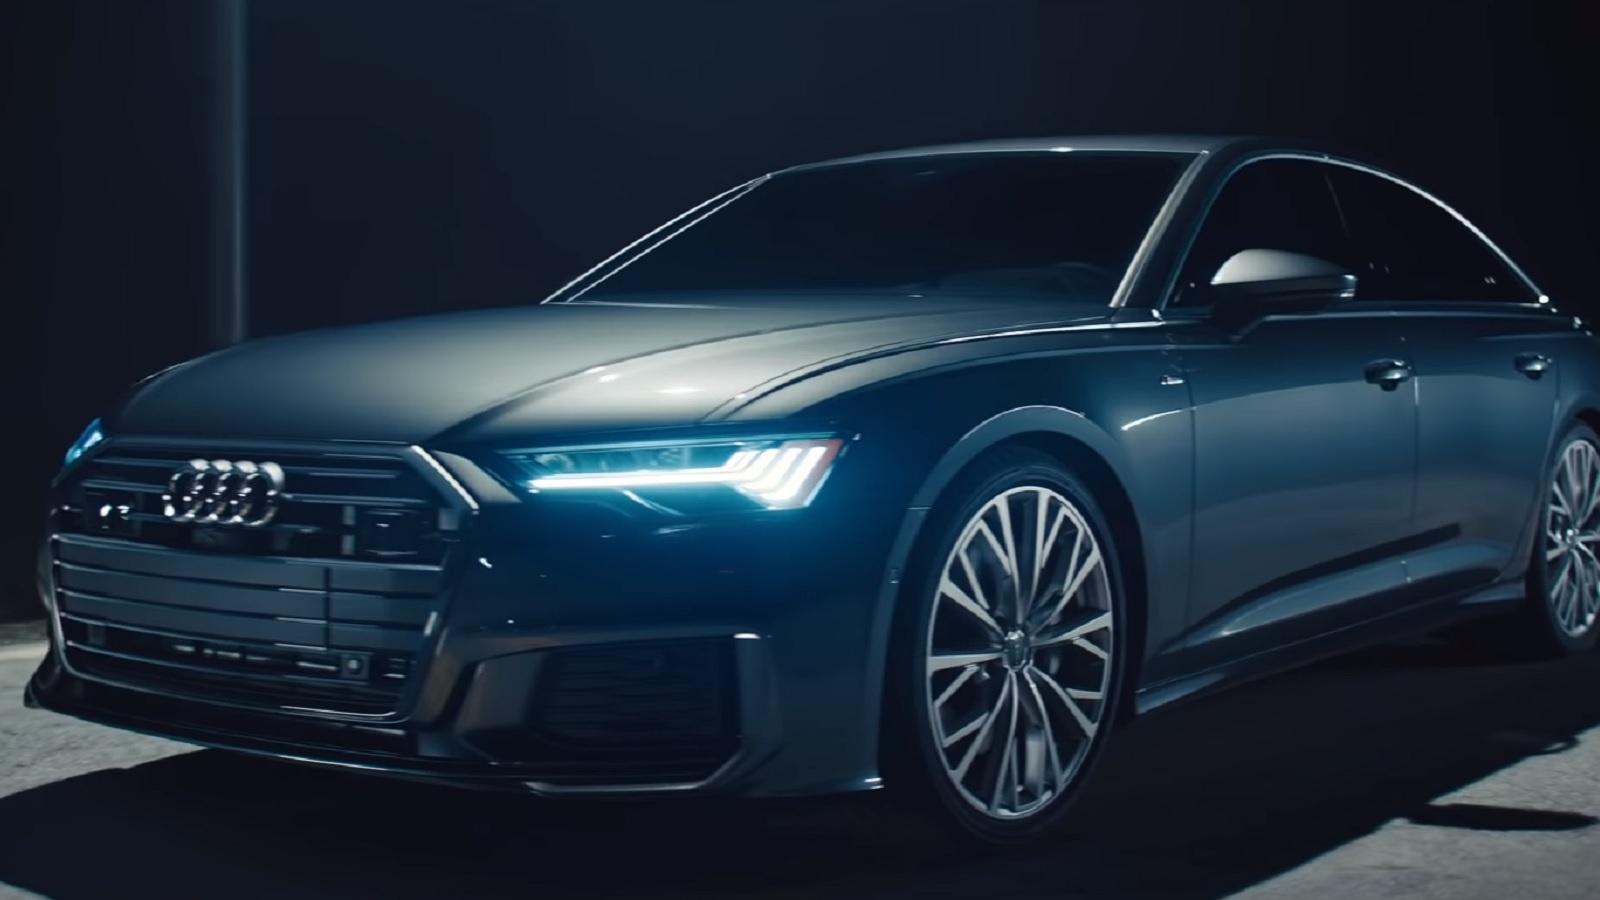 Audi Presents AllNew A A In A Very Dramatic Way - Audis